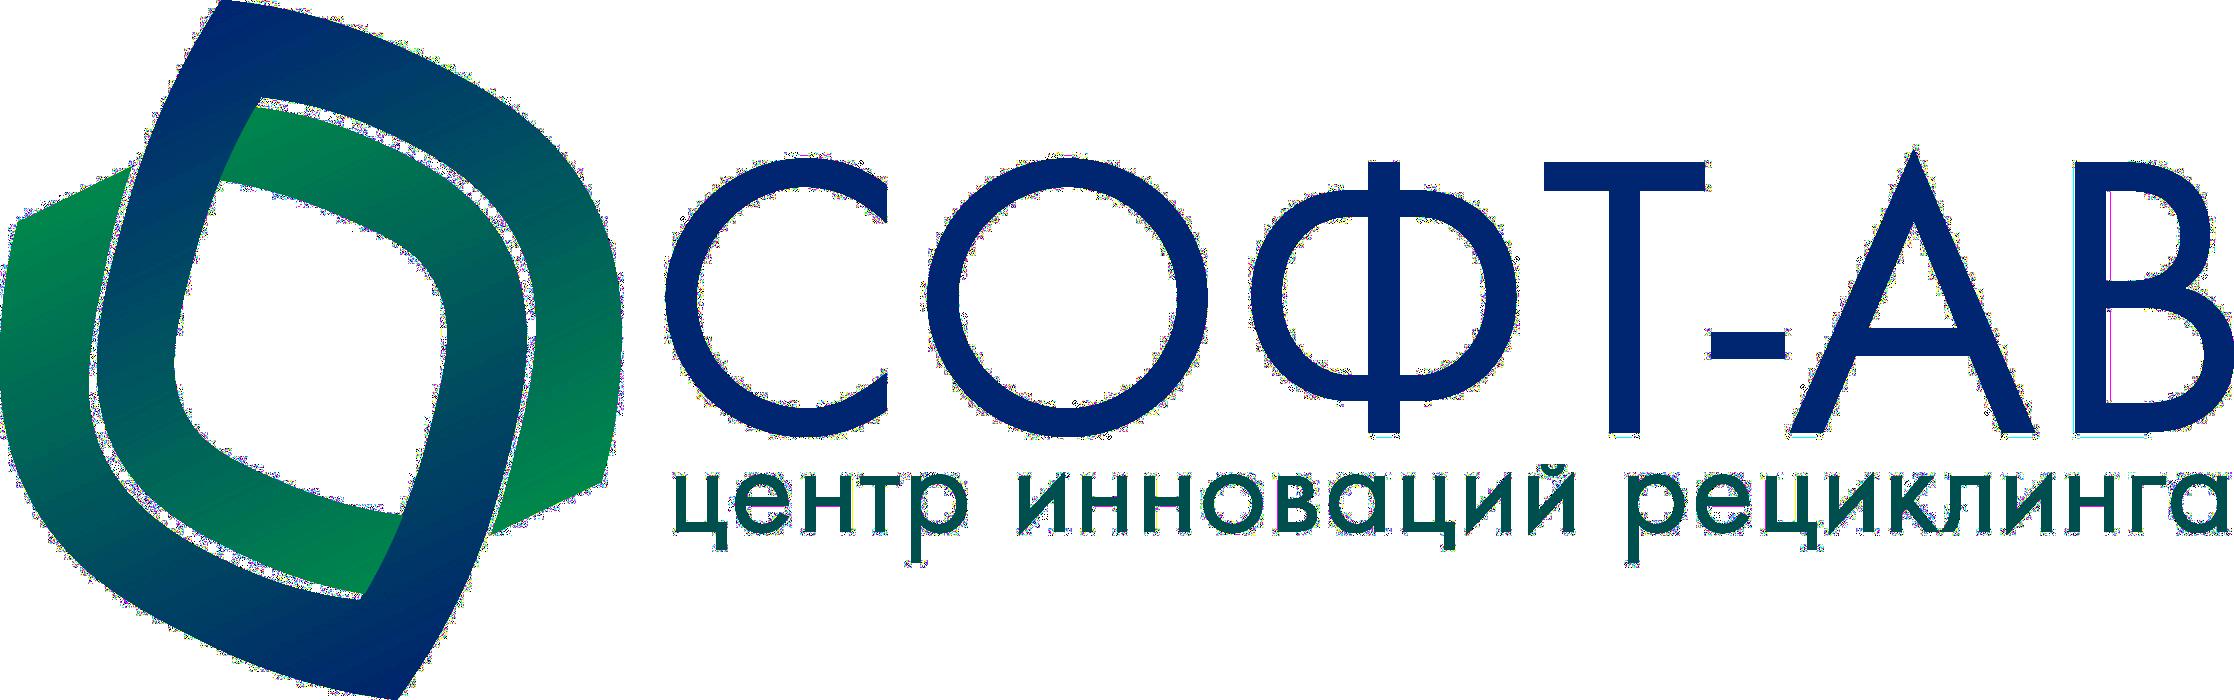 ЦИР СОФТ-АВ